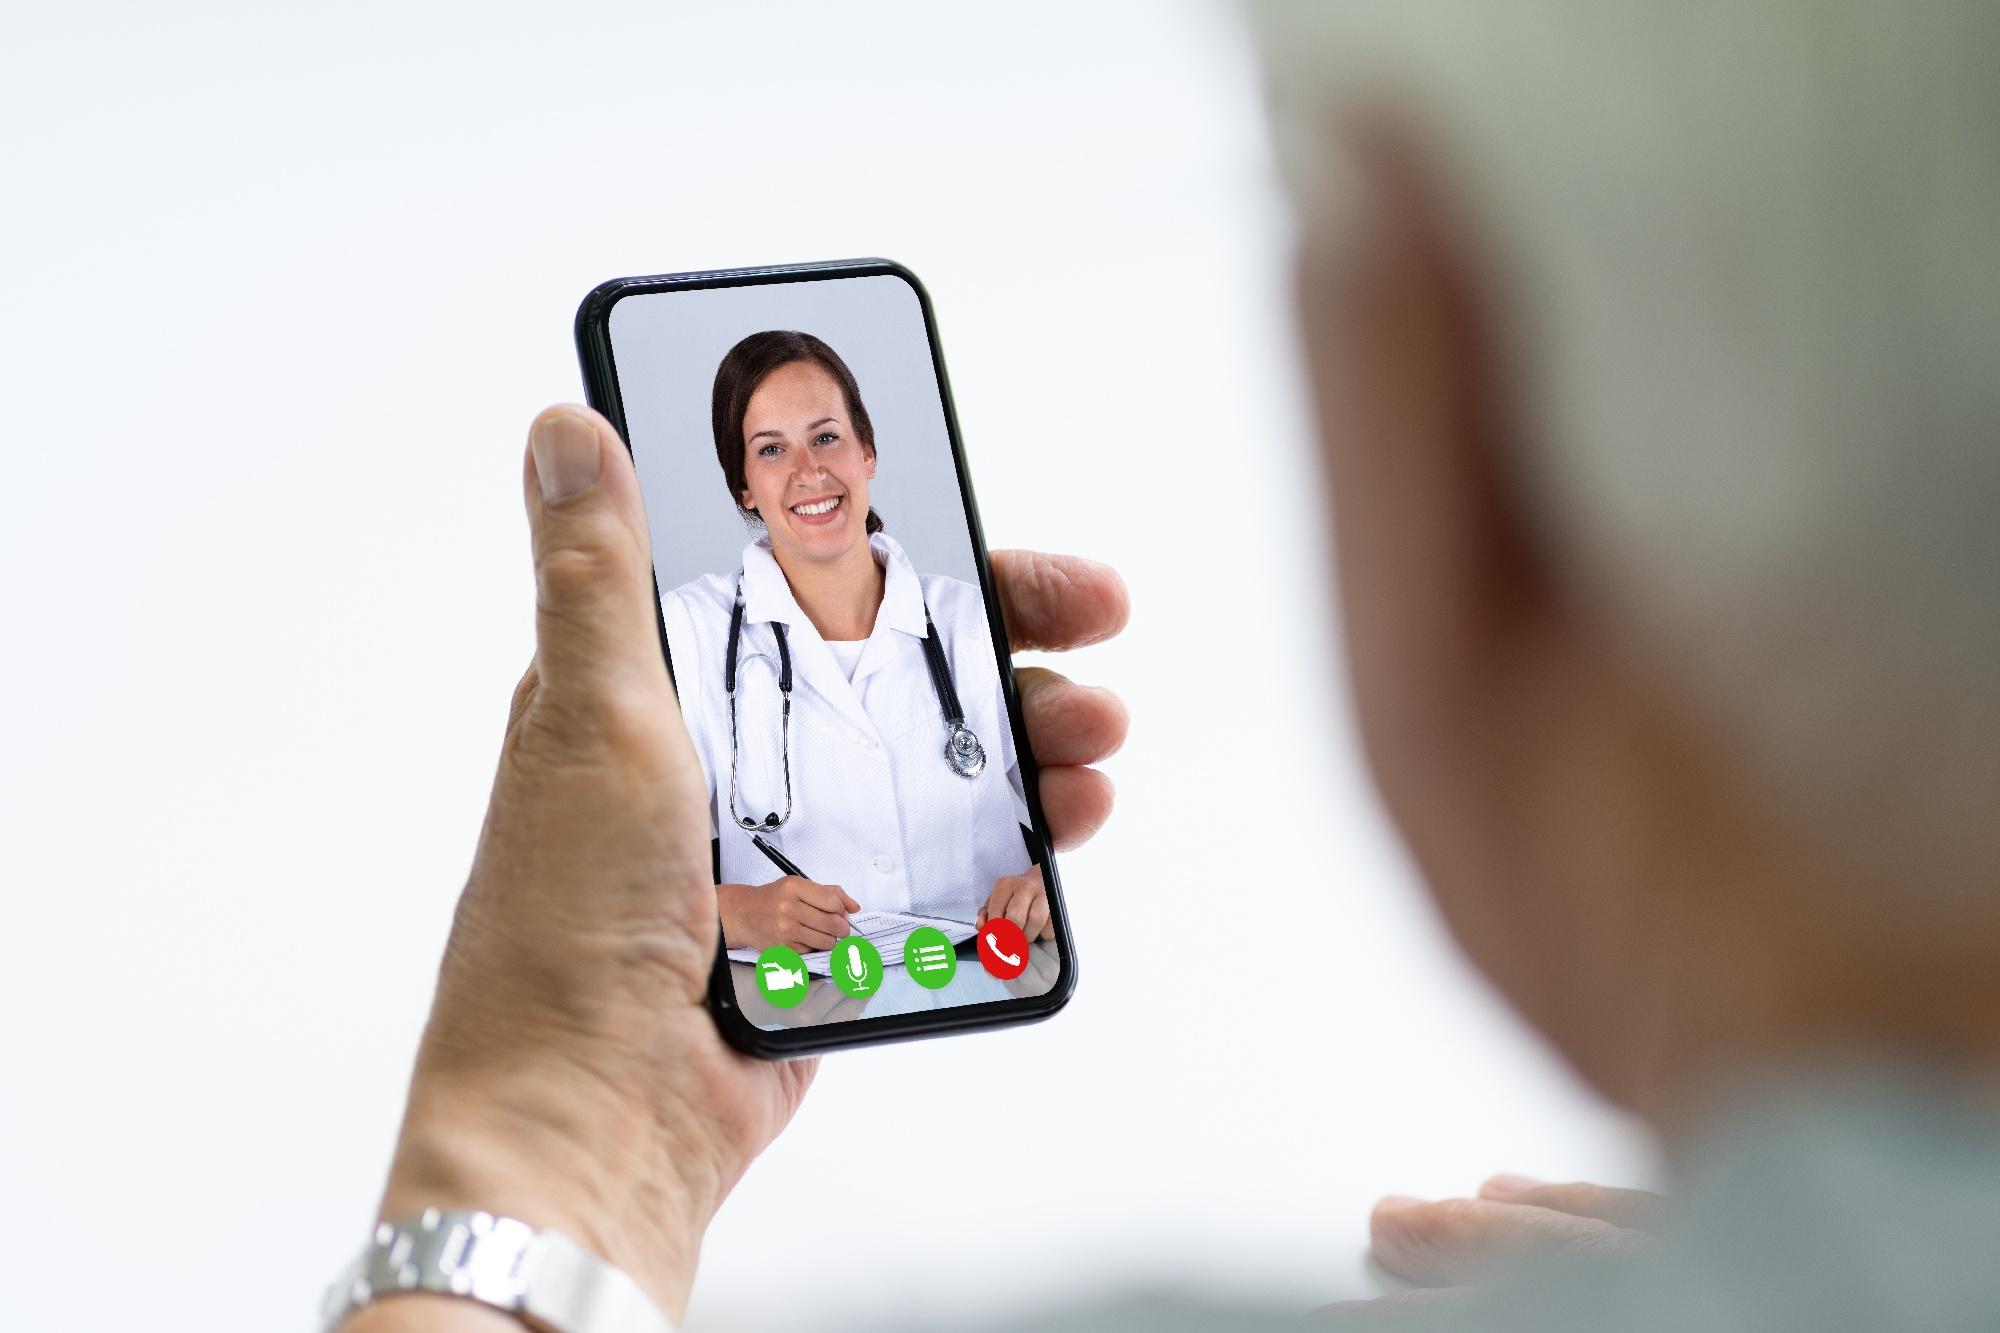 senior man visiting doctor via telehealth on smartphone